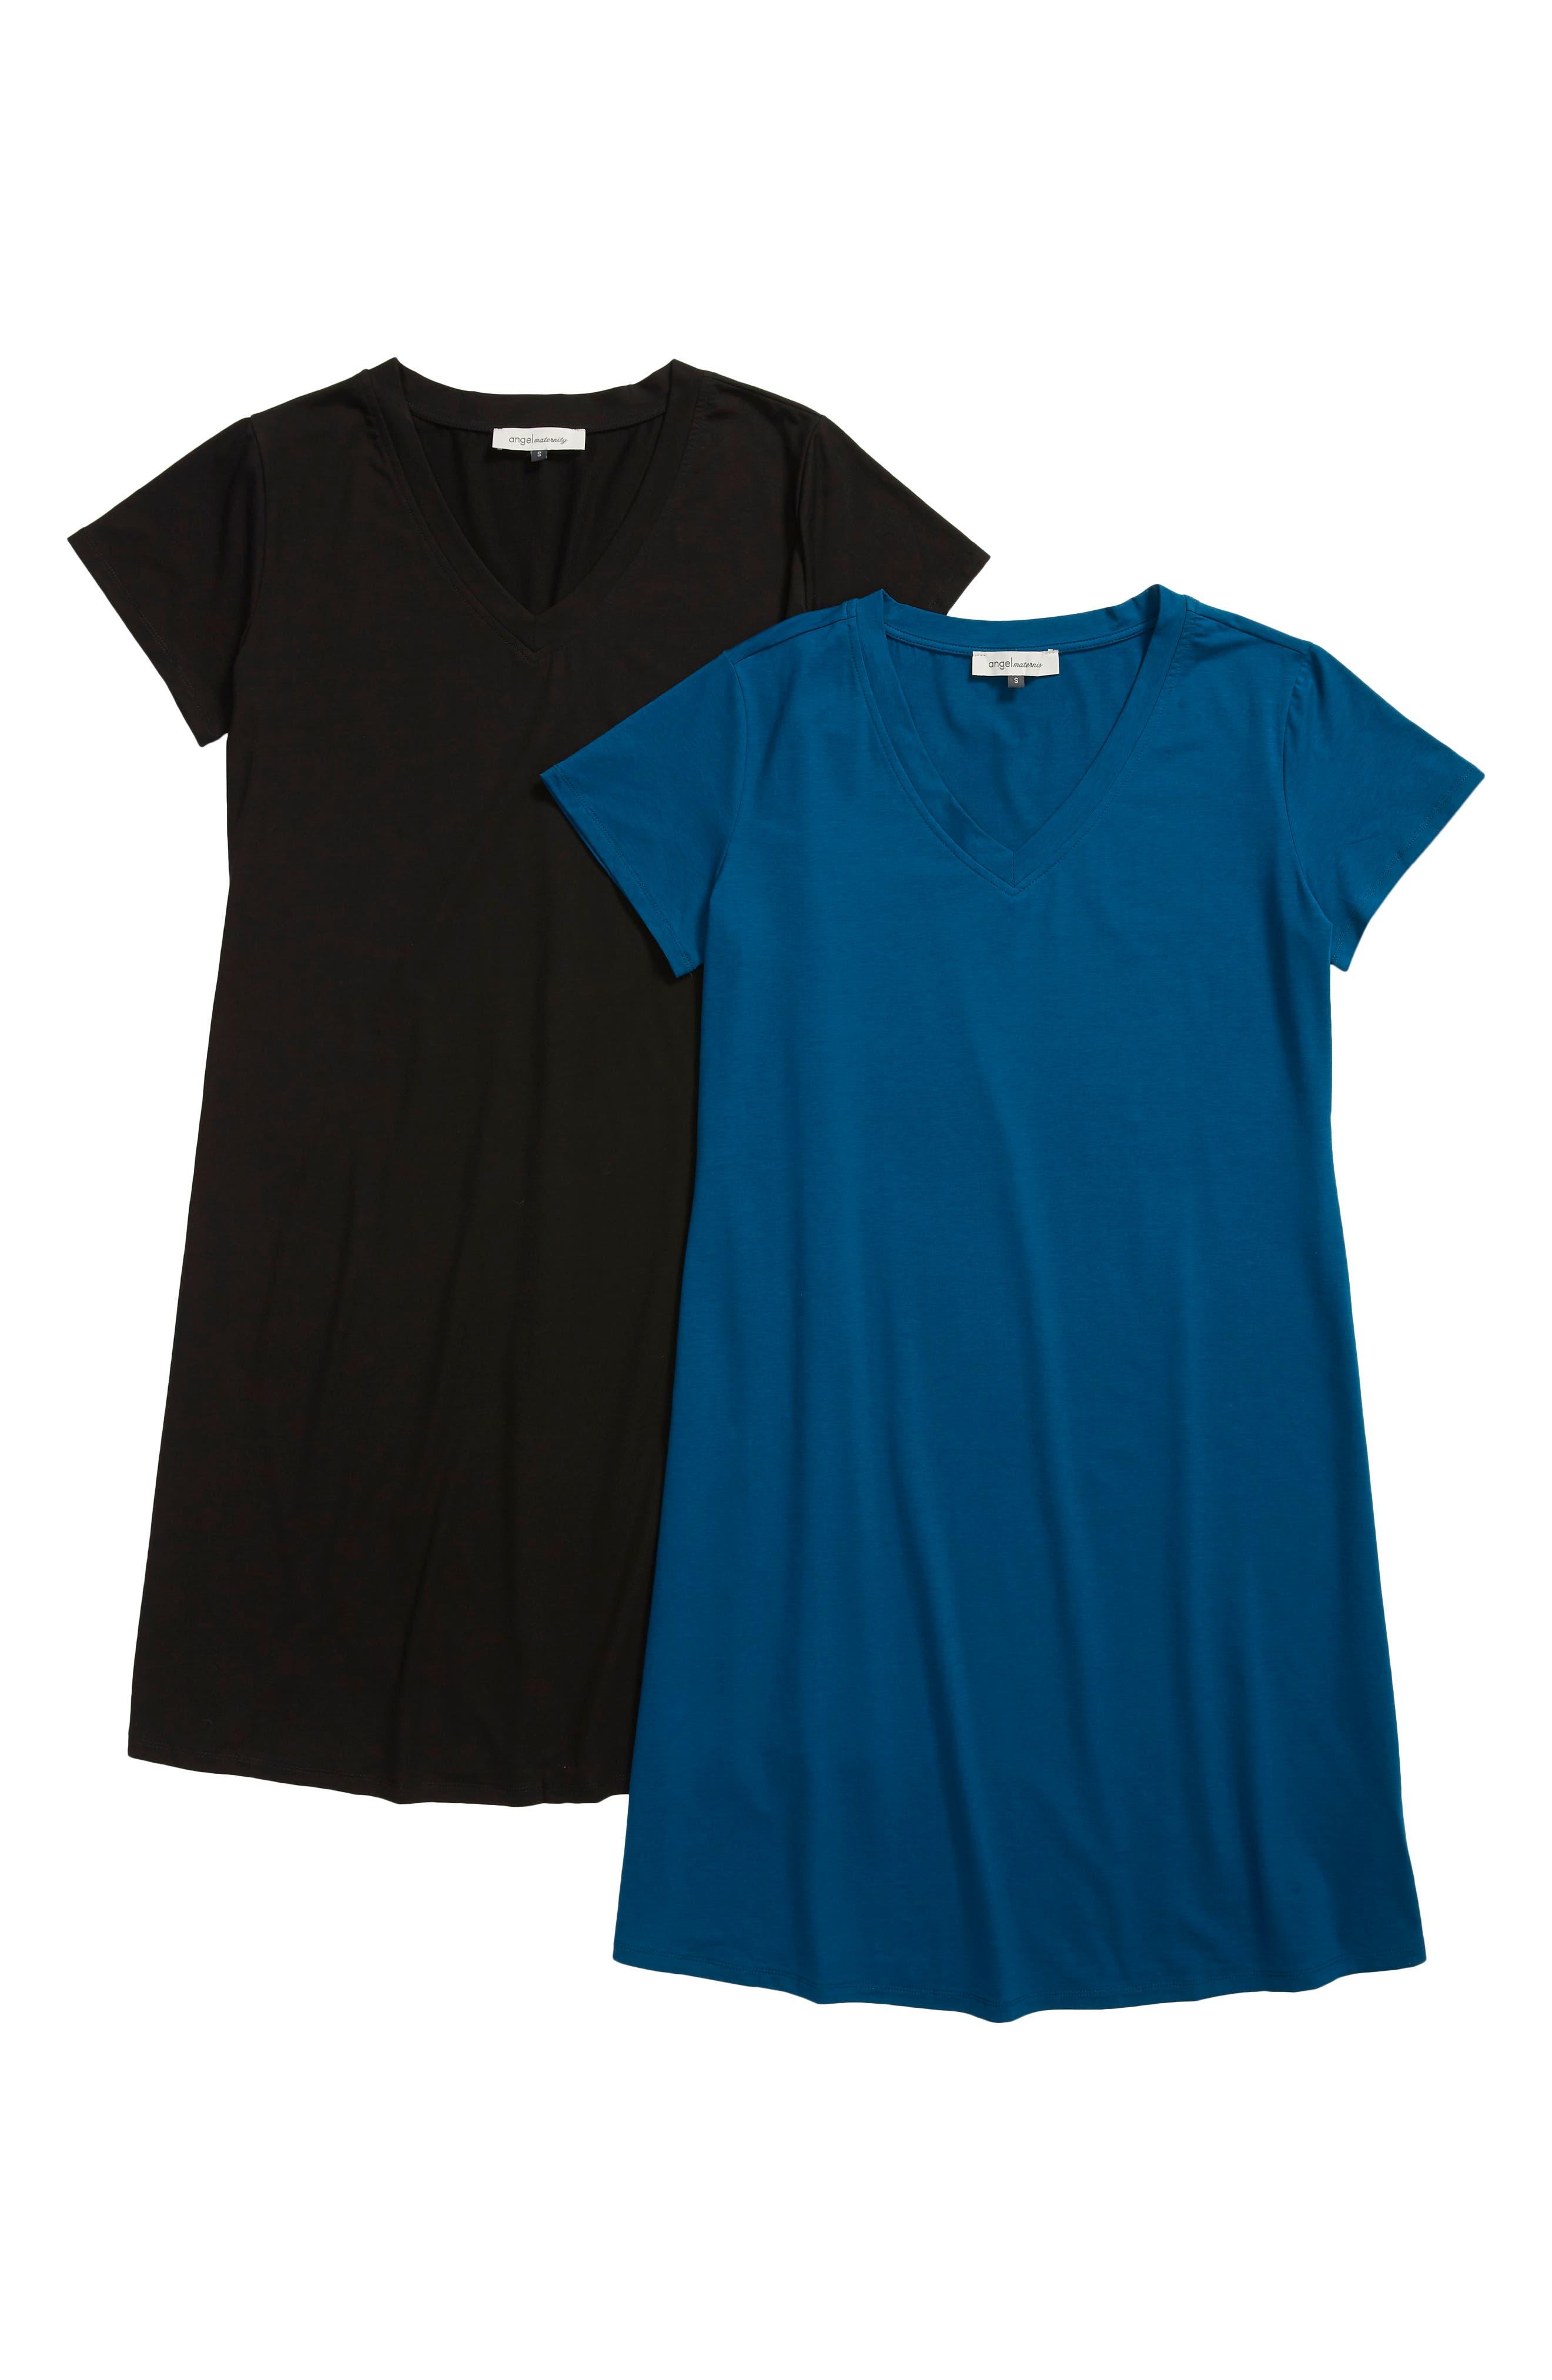 2-Pack Maternity T-Shirt Dresses